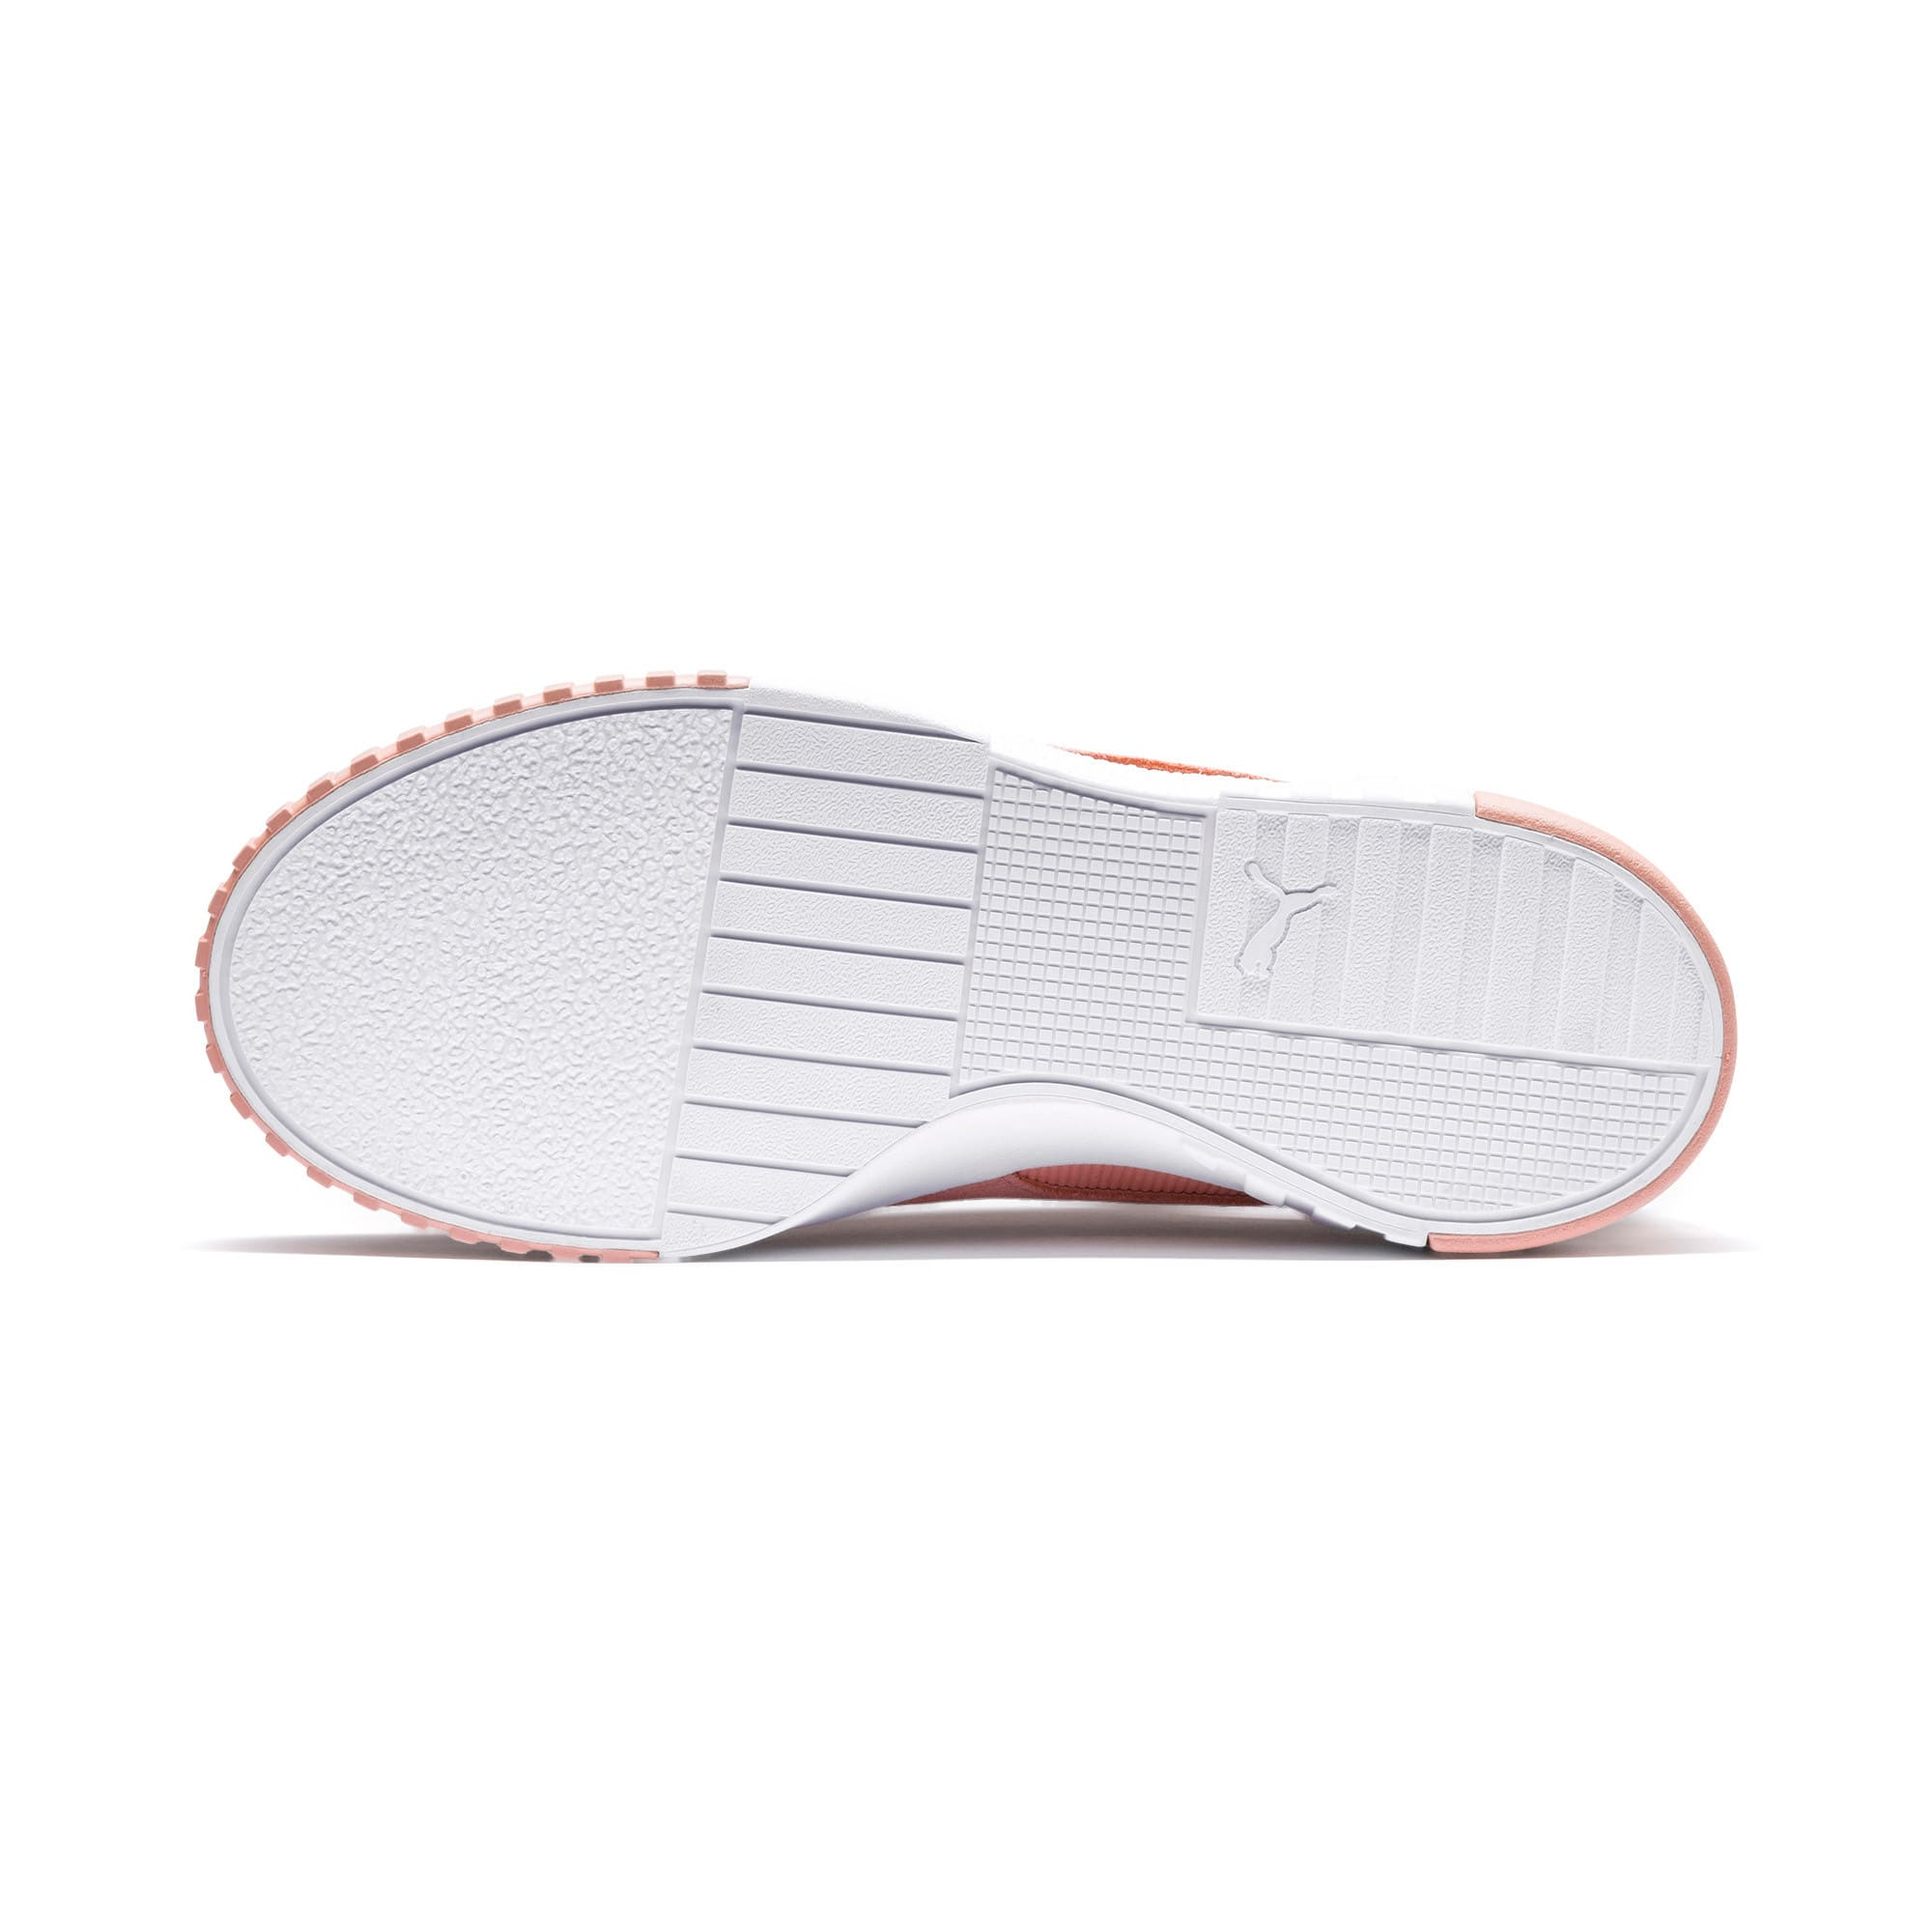 Thumbnail 5 of Cali Palm Springs Women's Sneakers, Peach Bud, medium